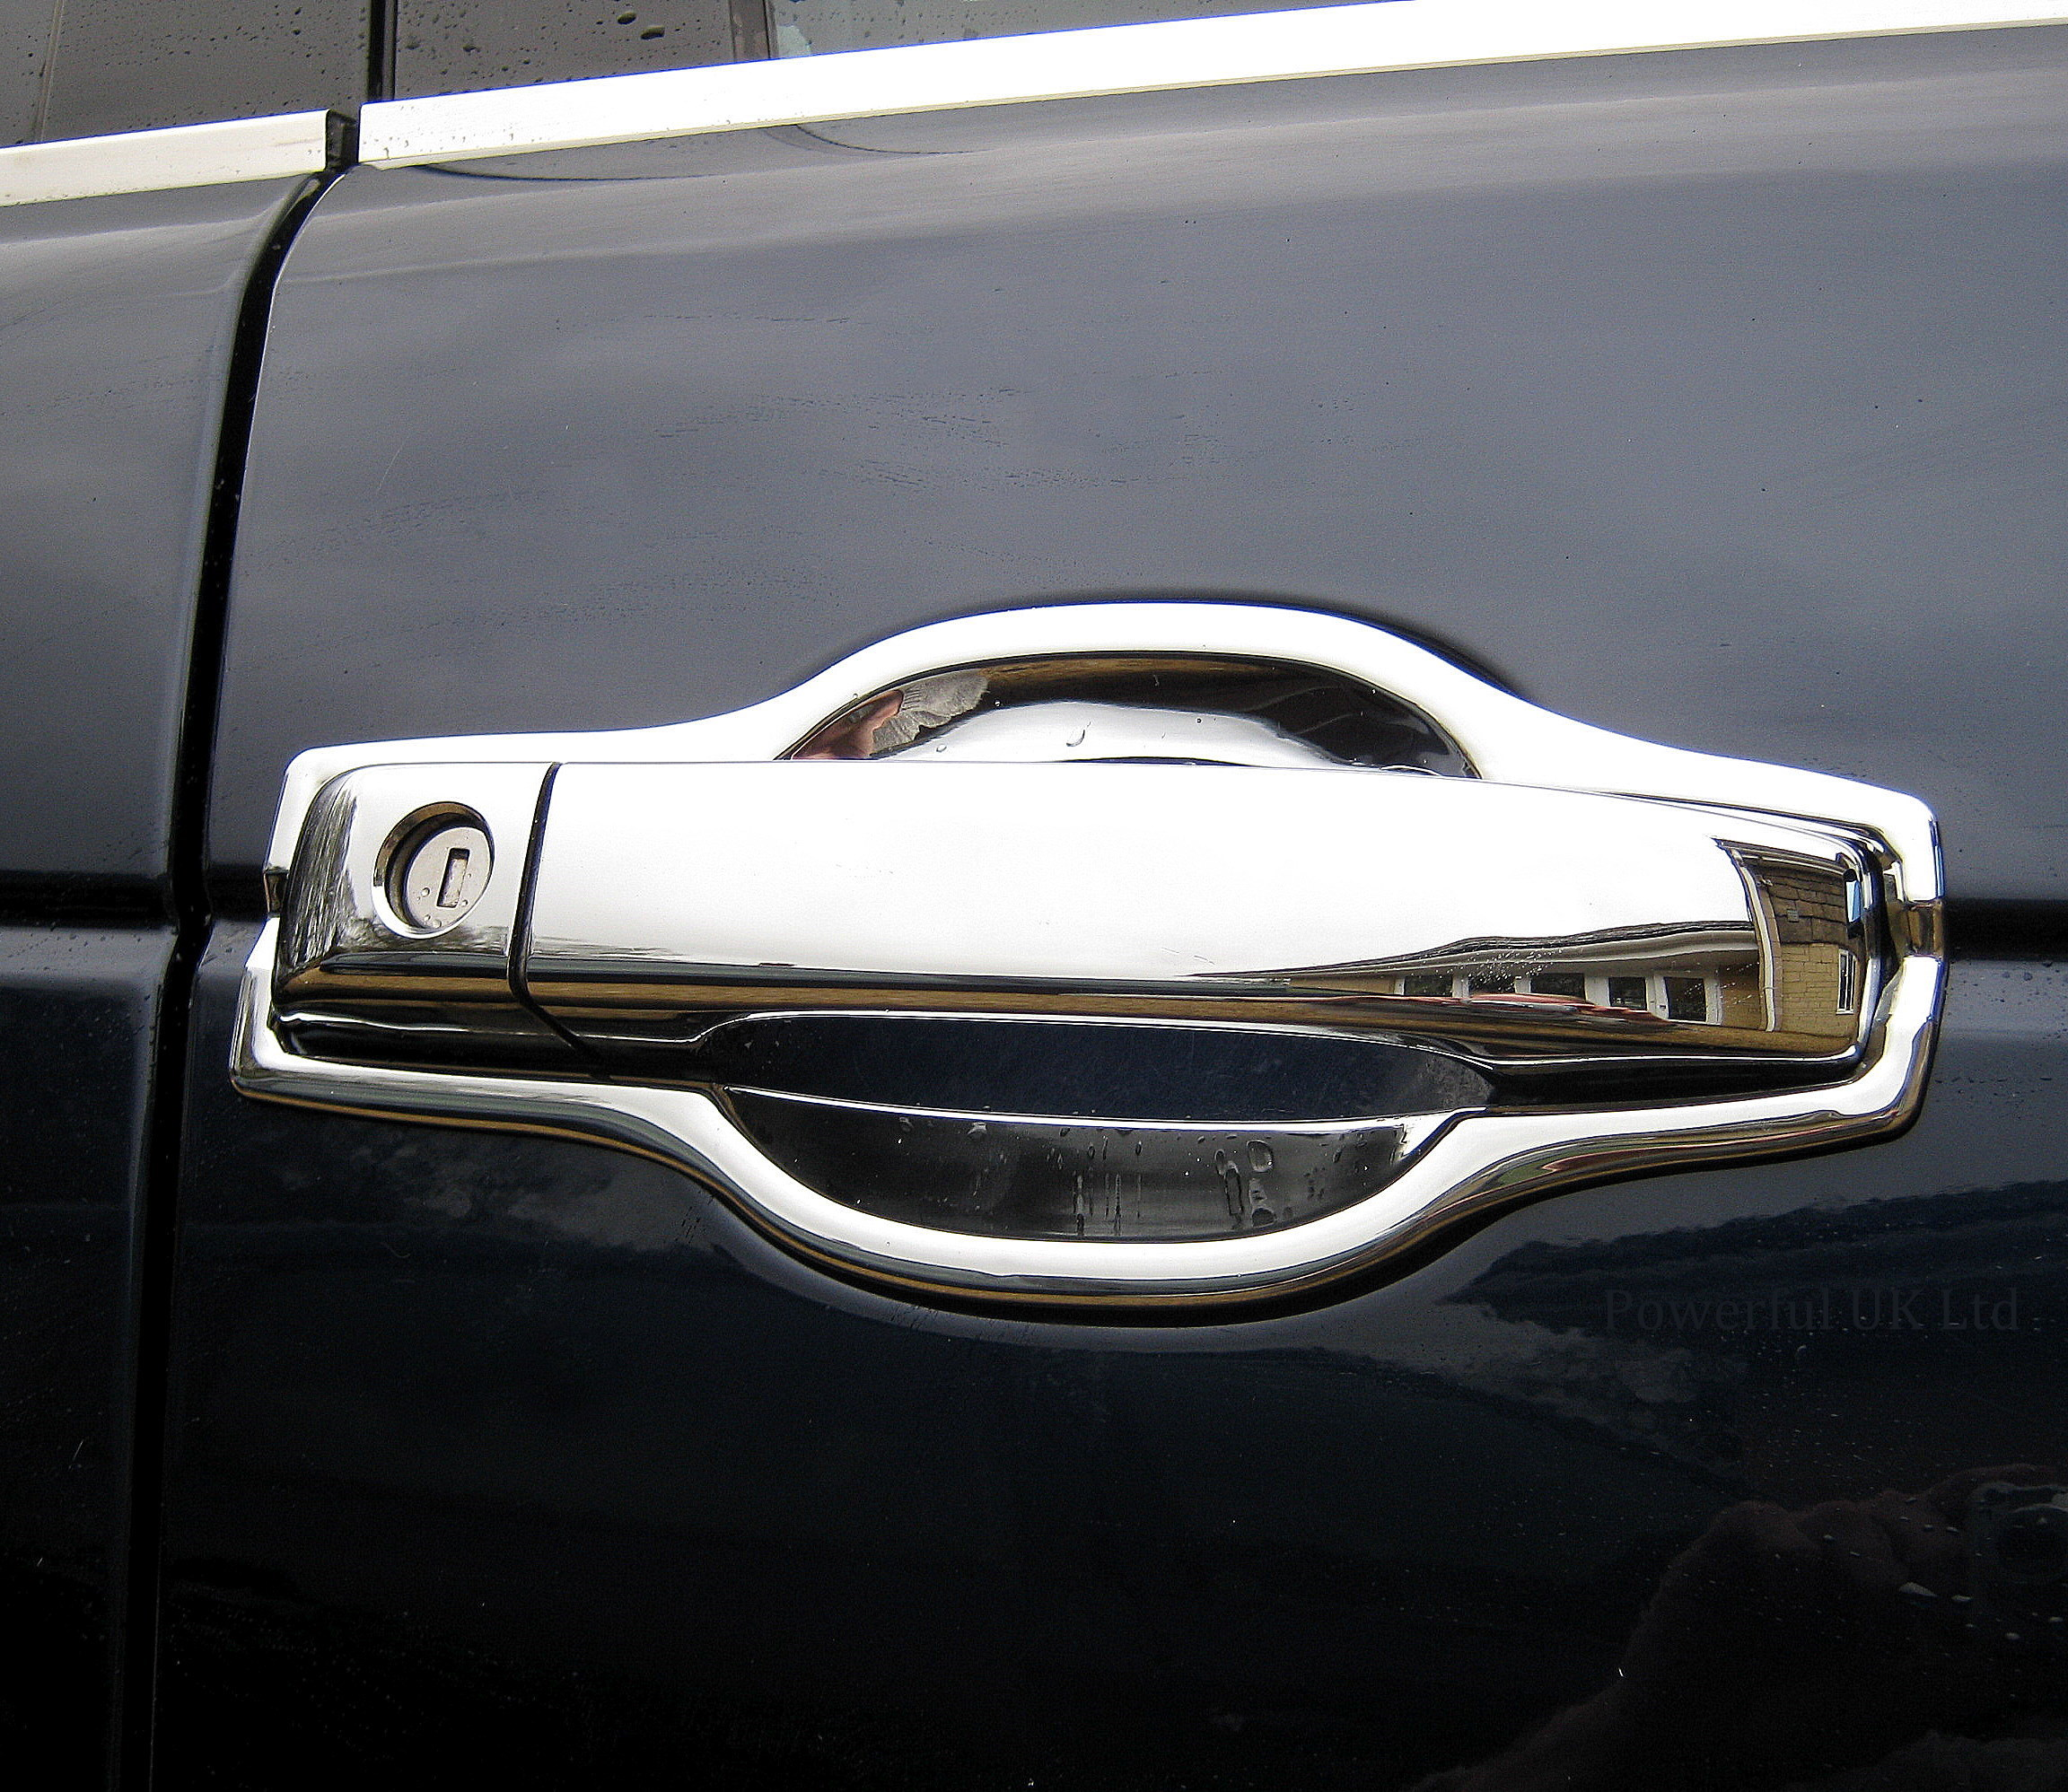 Honda Jazz Gk Supercharger: Chrome Door Handle Surrounds For Range Rover L322 Vogue